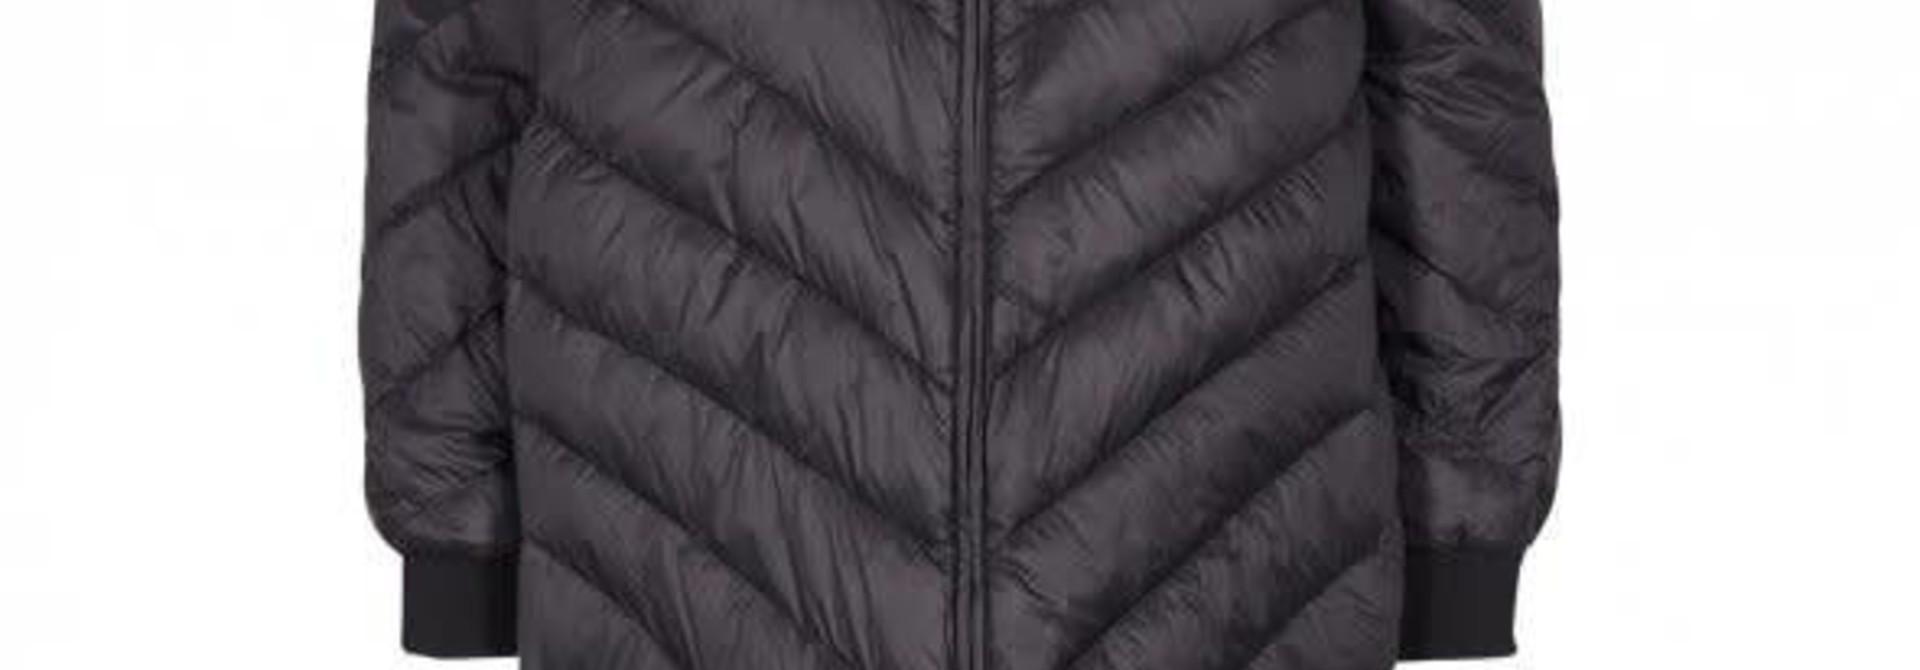 Nala Long Down Jacket Black